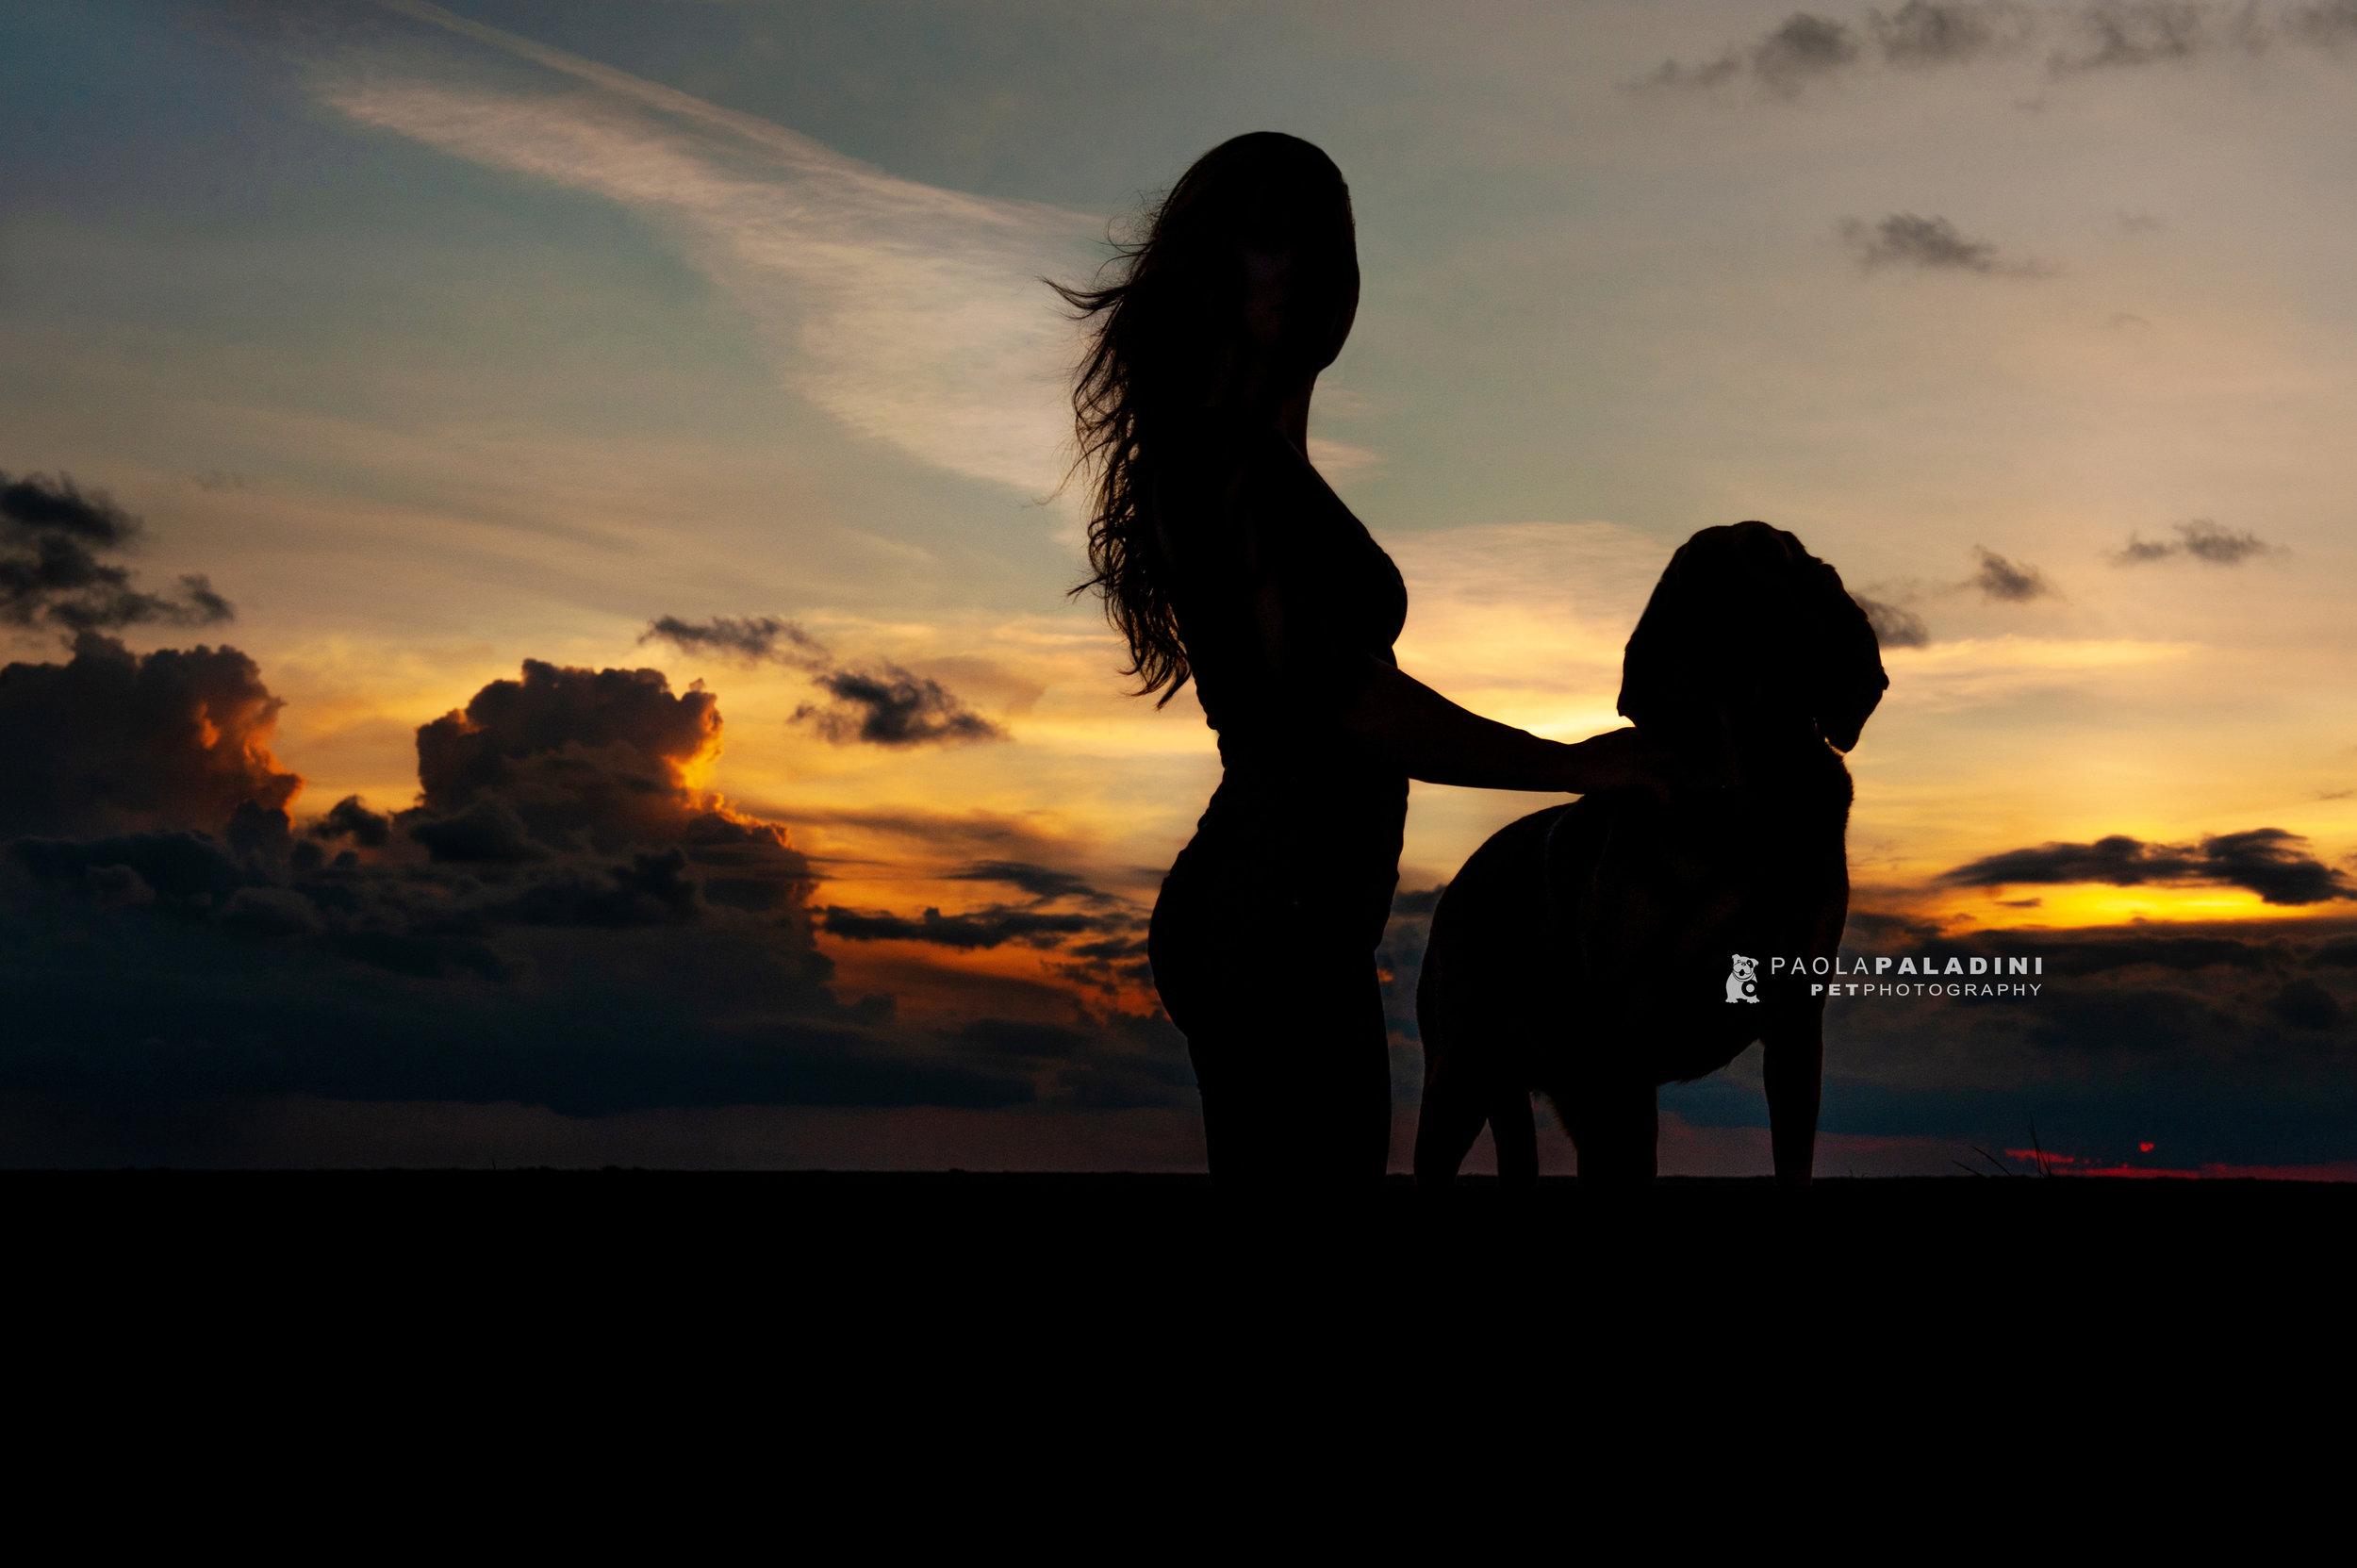 Paola-Paladini-Sunset-Silhouettes-Dog-Bloodhound-four